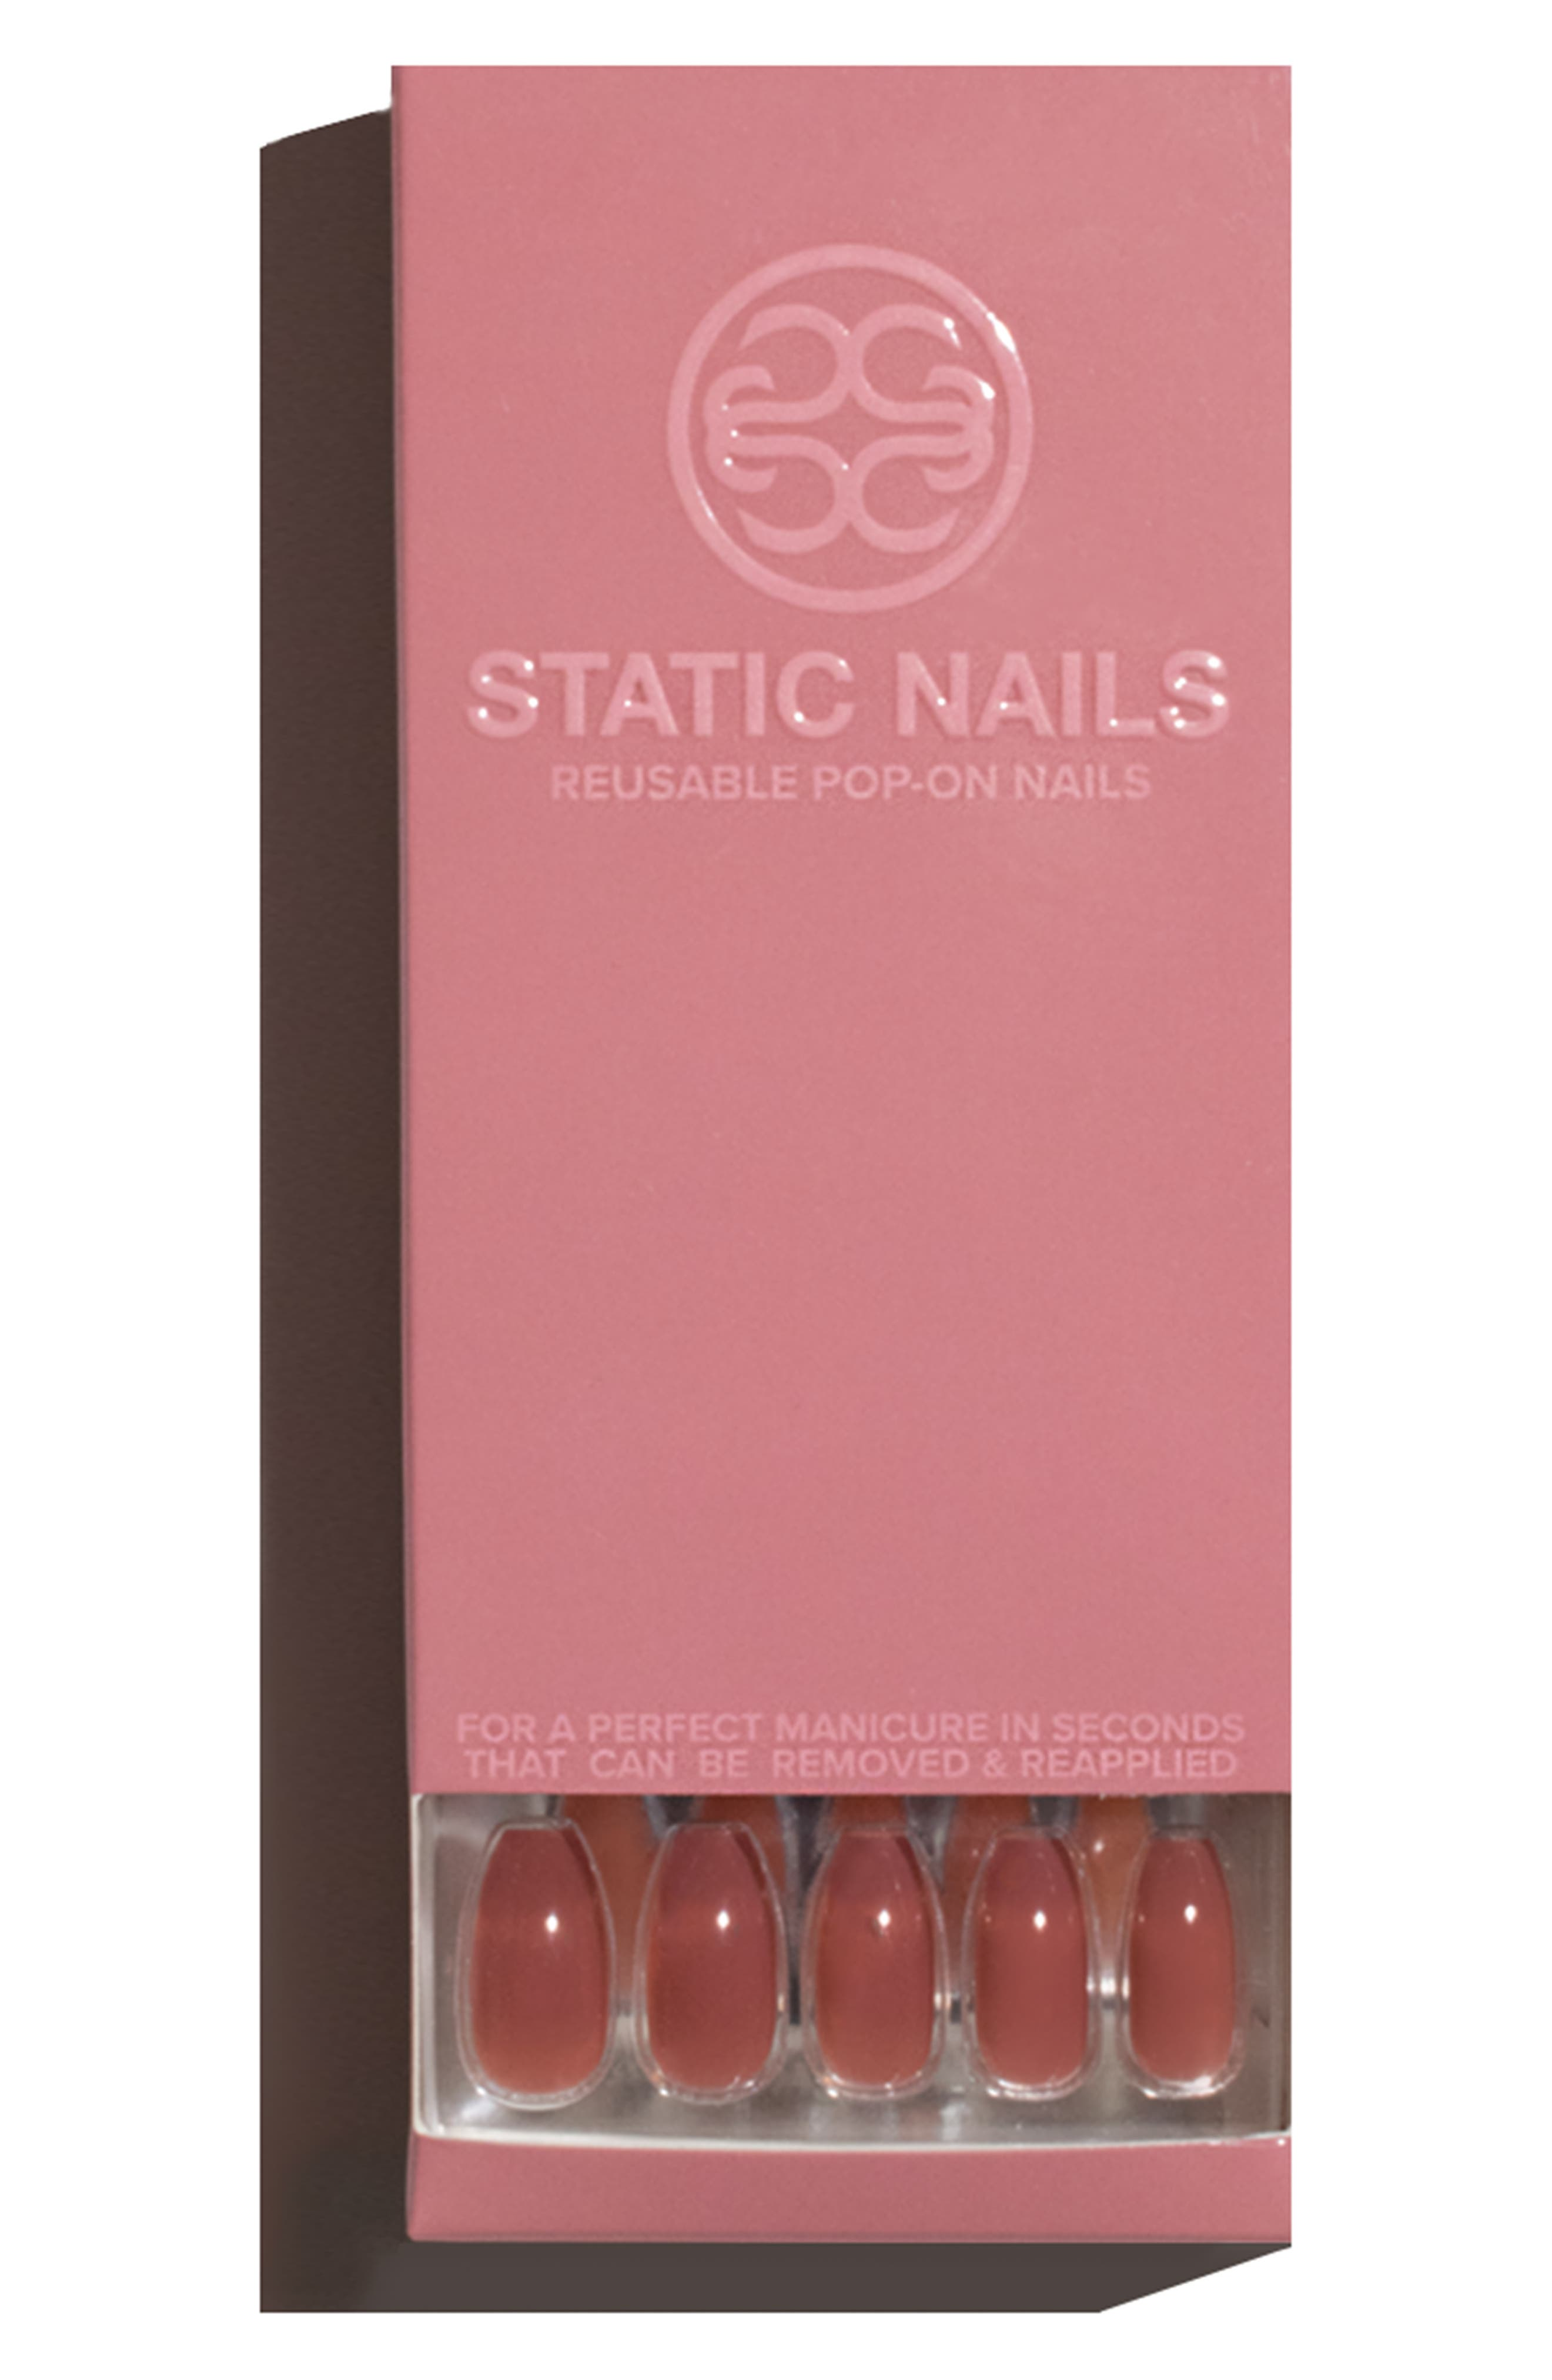 Dusty Rose Pop-On Reusable Manicure Set,                             Alternate thumbnail 2, color,                             DUSTY ROSE